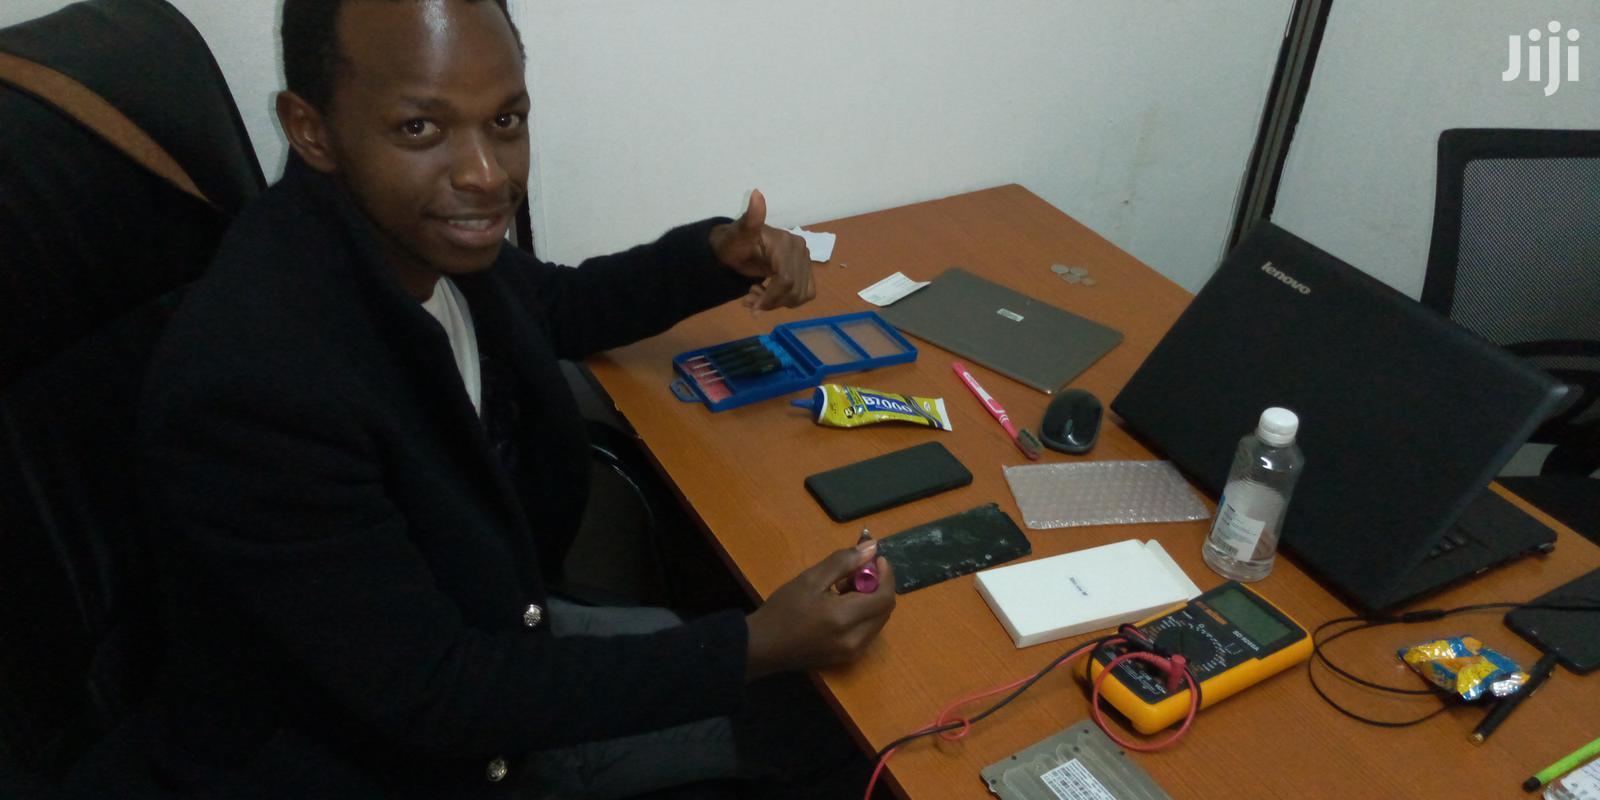 Professional Laptop And Phone Repair Service